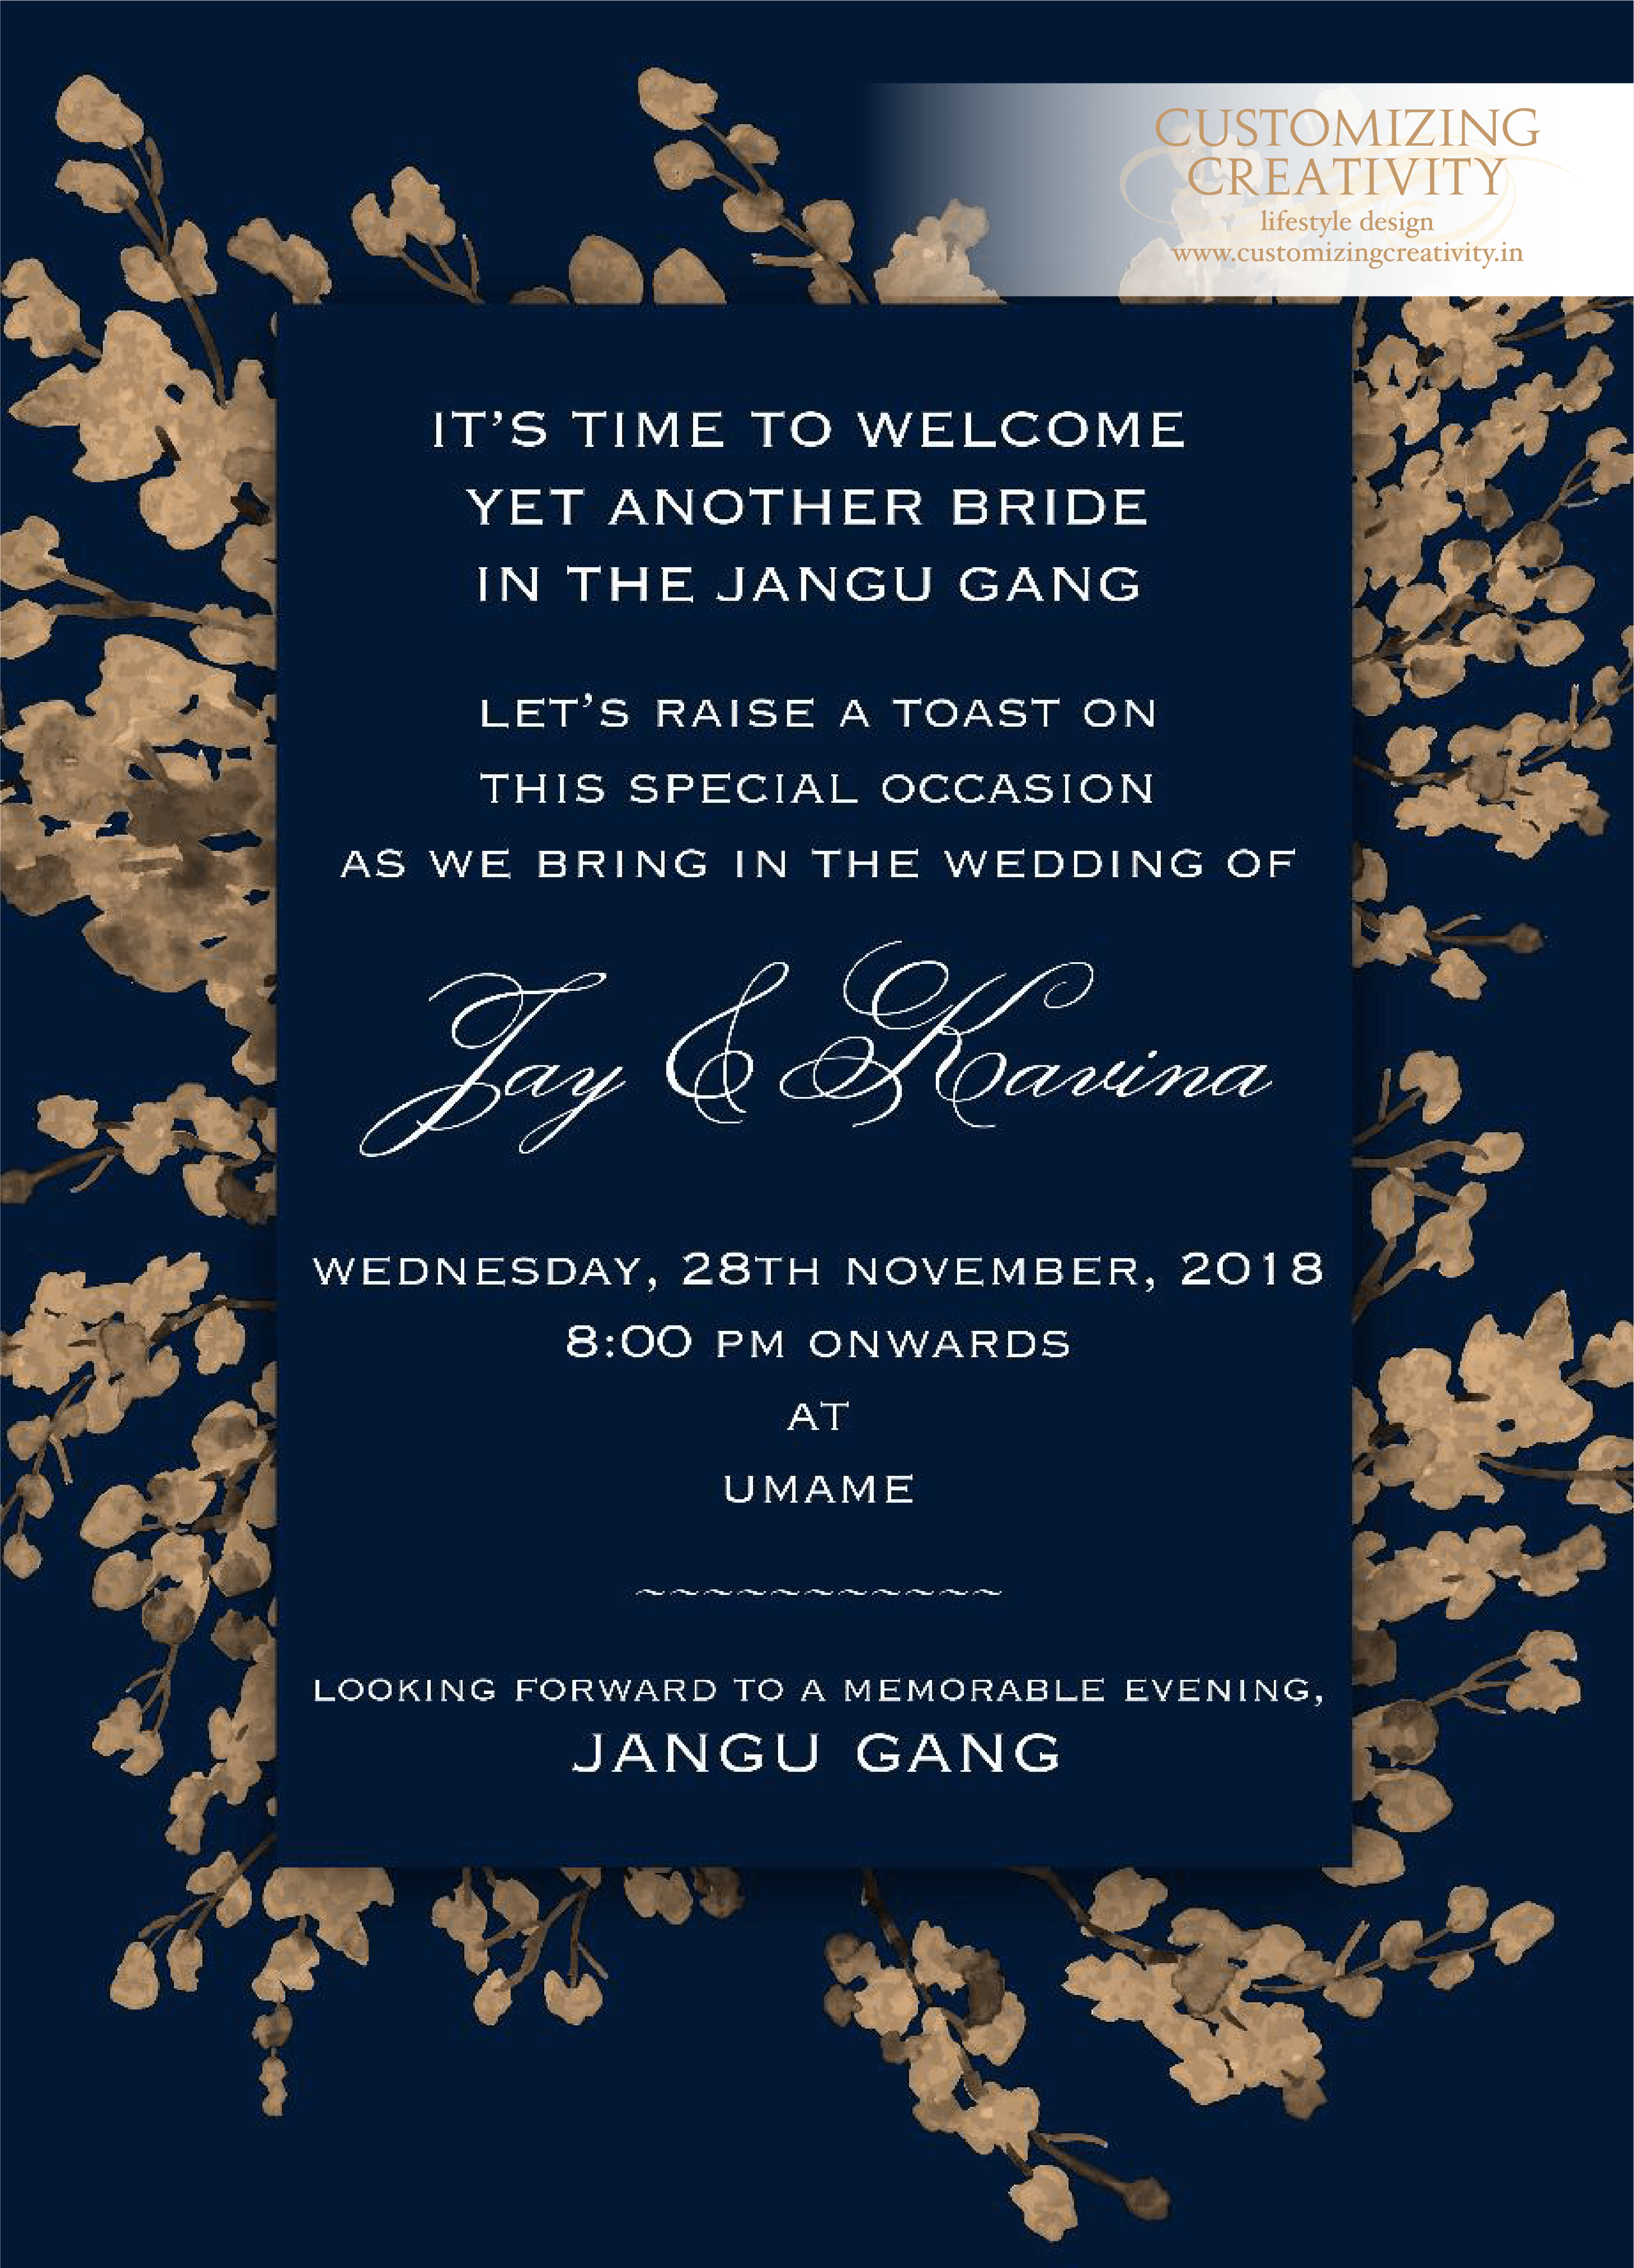 Wedding Invitation Cards Indian Wedding Cards Invites Wedding Stati Unique Wedding Invitation Wording Wedding Invitations Stationery Wedding Invitations Diy